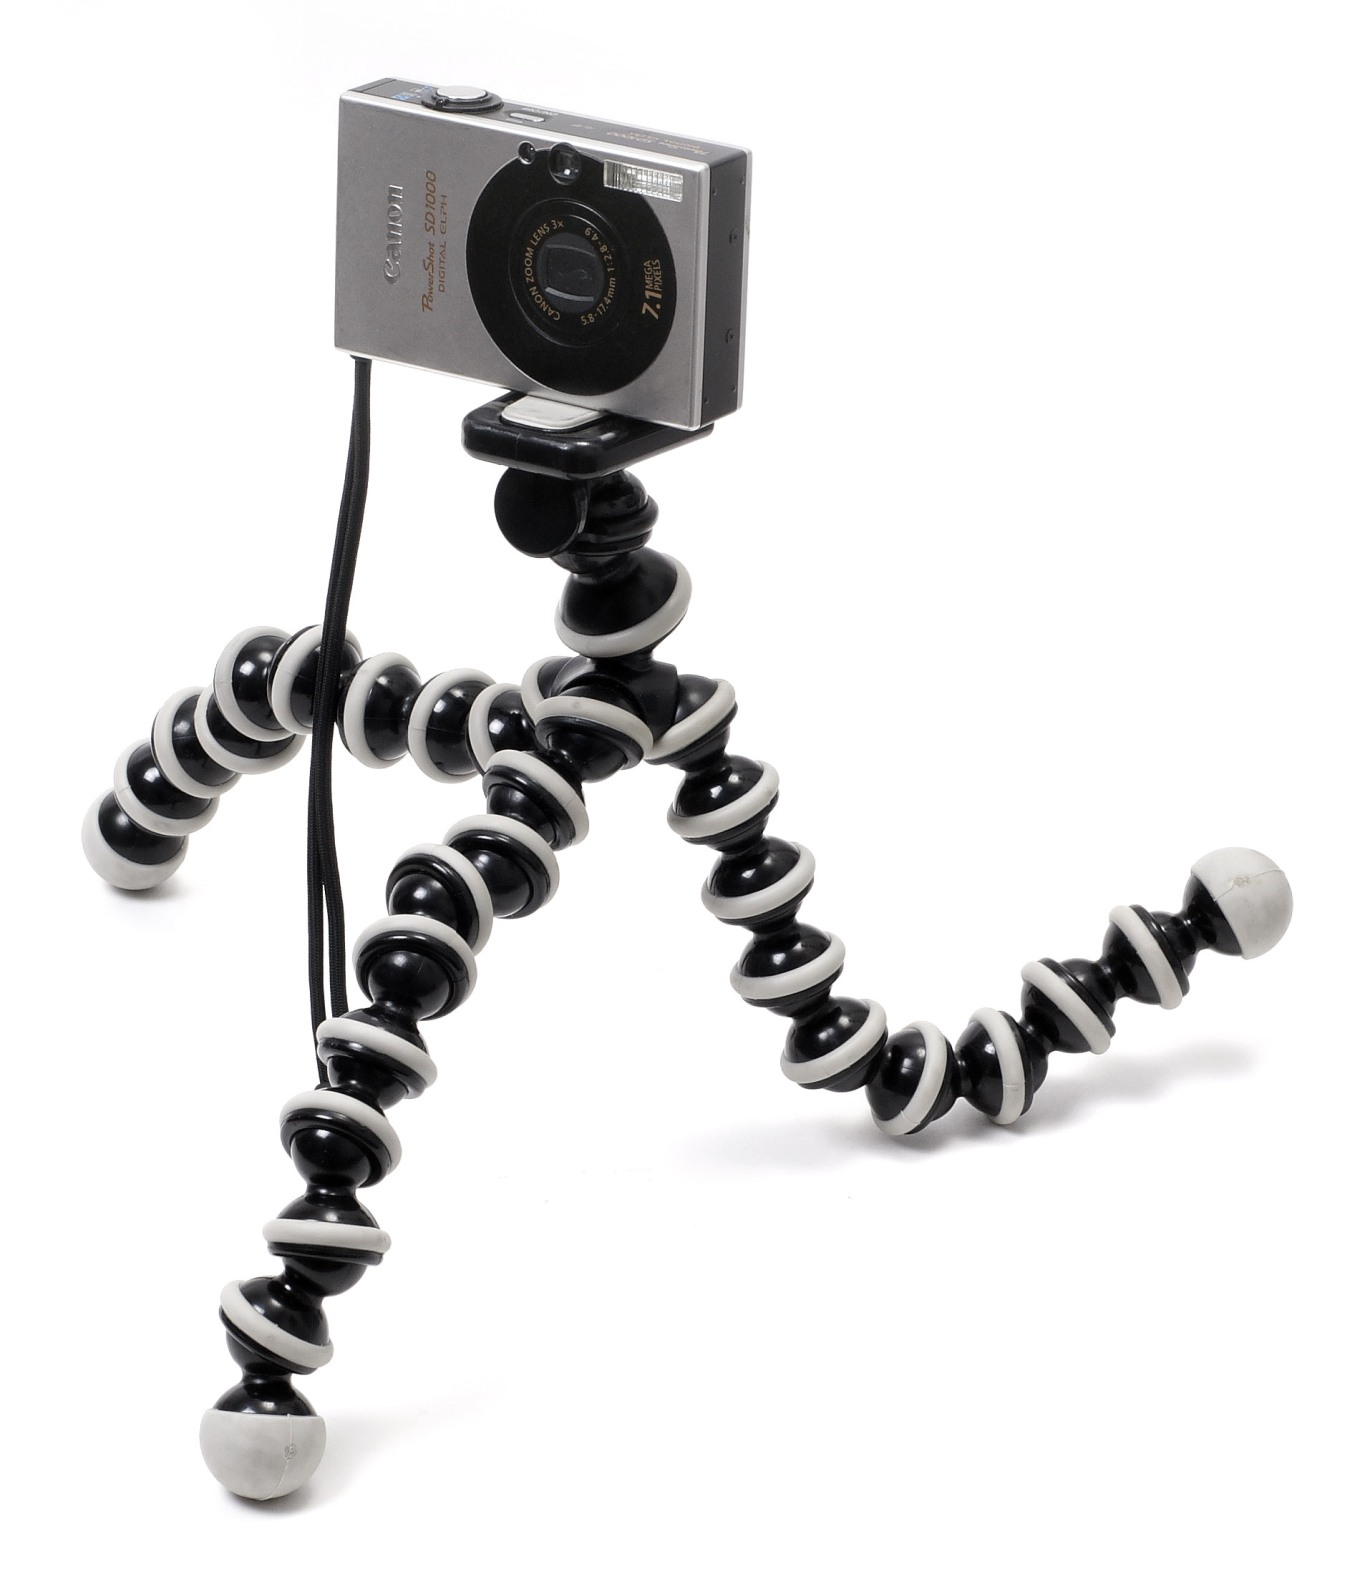 Gorillapod-with-camera.jpg